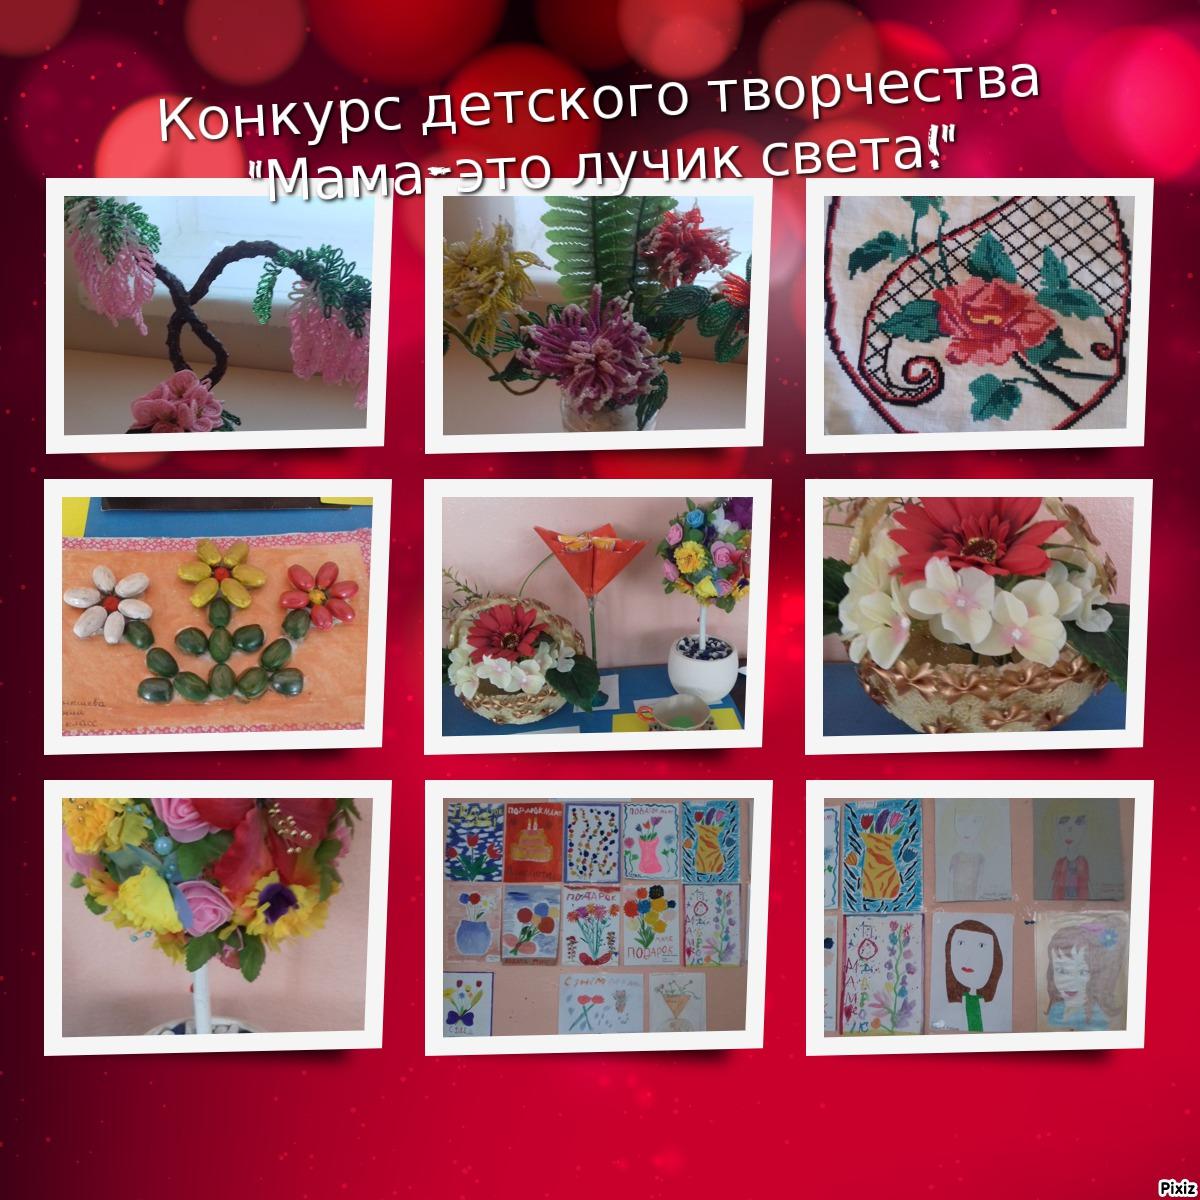 http://mbou7stpanitska.ucoz.ru/_nw/2/50498145.jpg